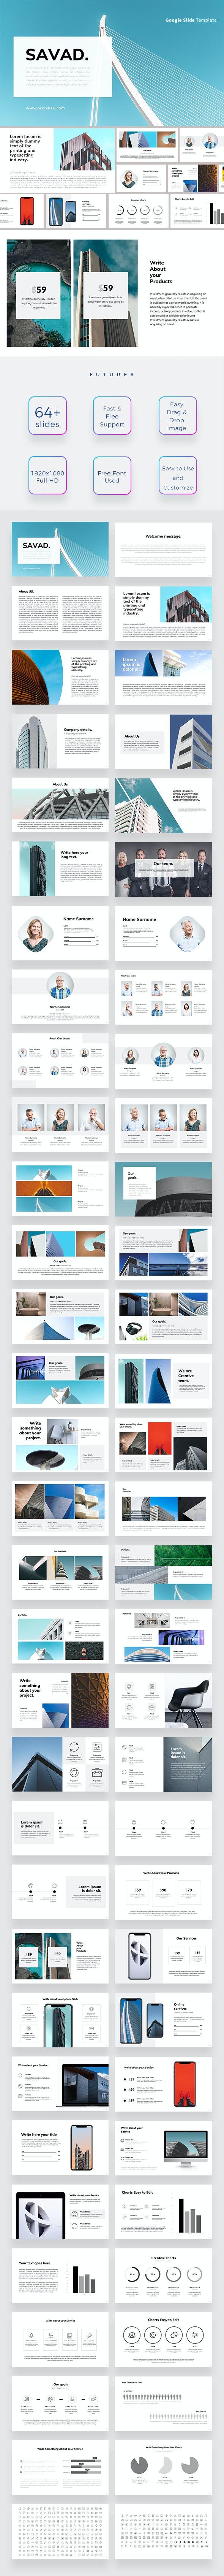 Savad Gogle Slides - Google Slides Presentation Templates